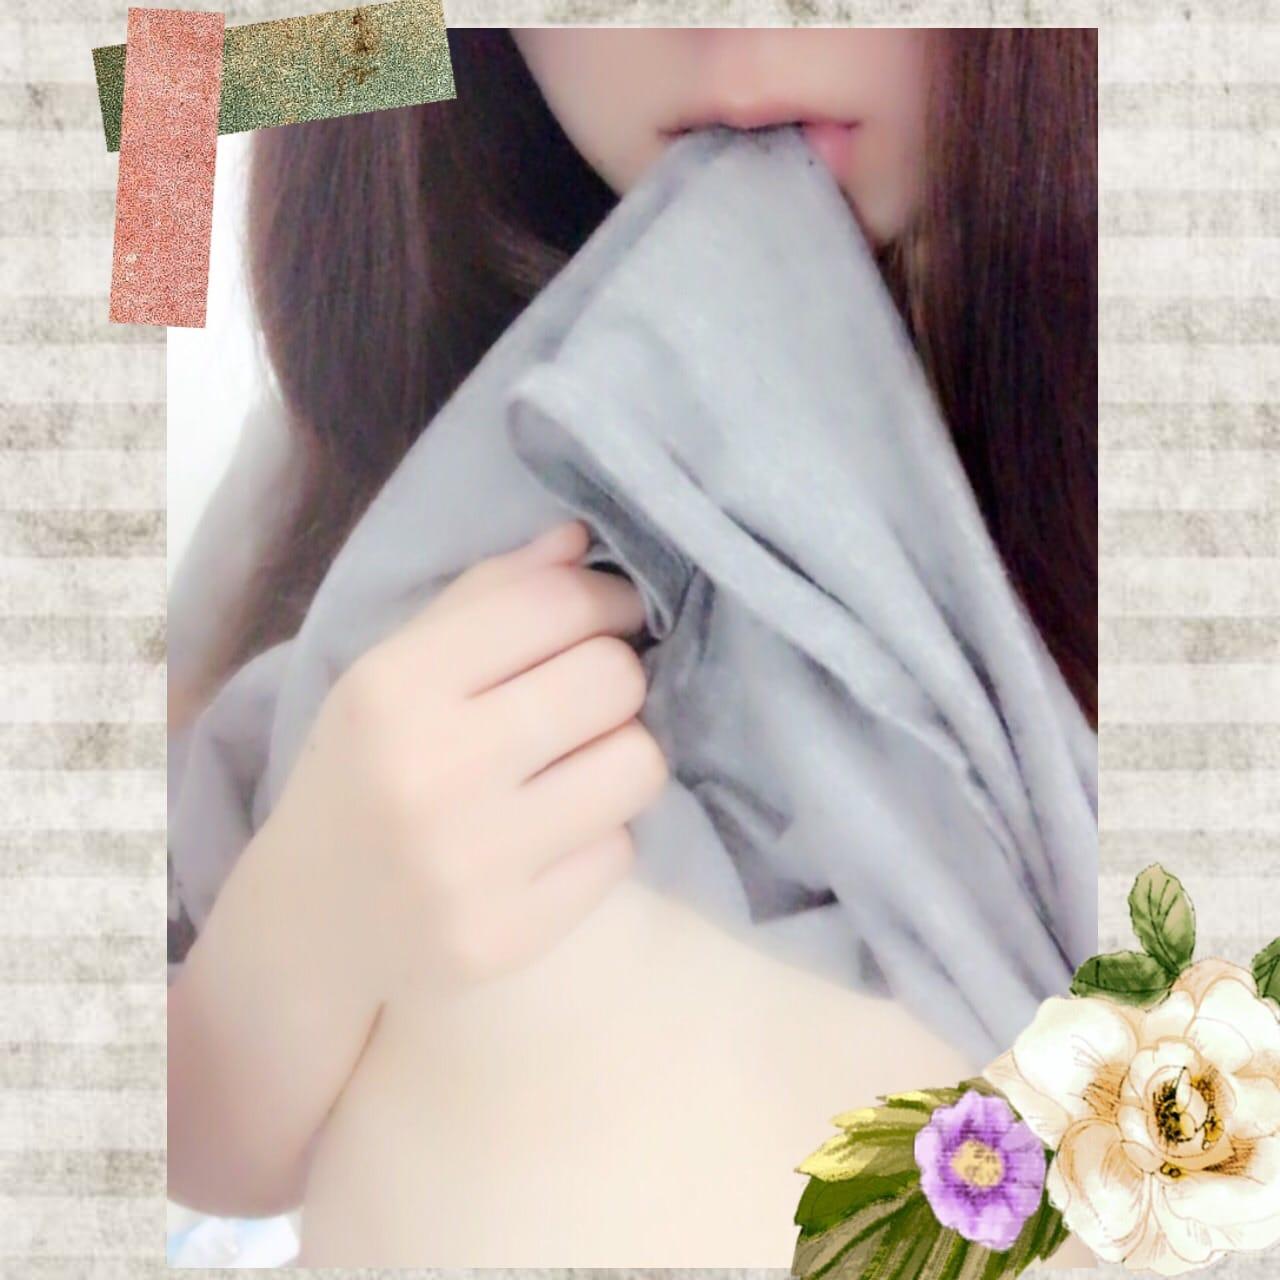 「୧(๑•̀ㅁ•́๑)૭✧」09/28(09/28) 11:13 | Hina-ひな-の写メ・風俗動画